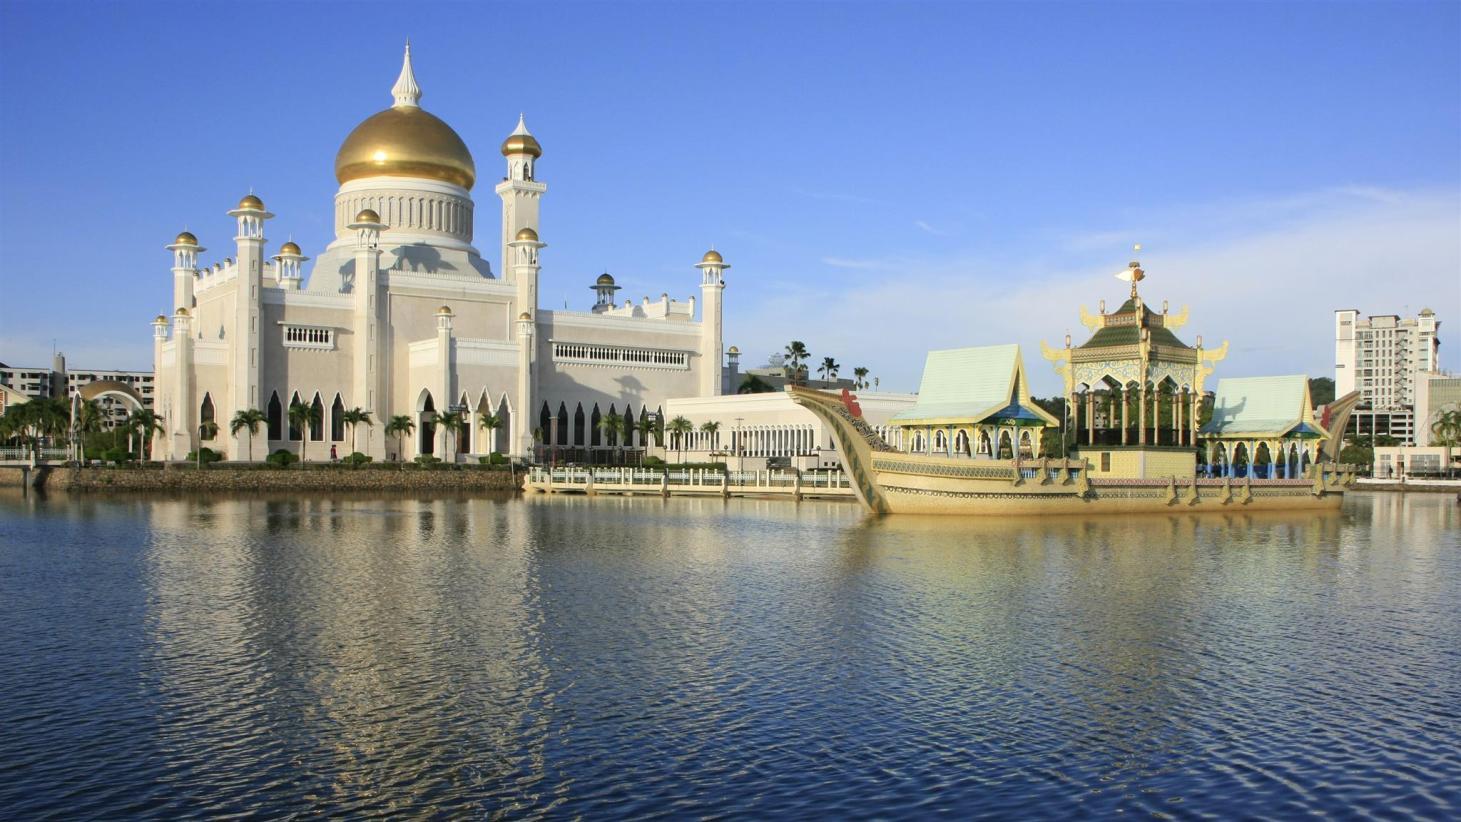 dia diem du lich noi tieng tai Brunei